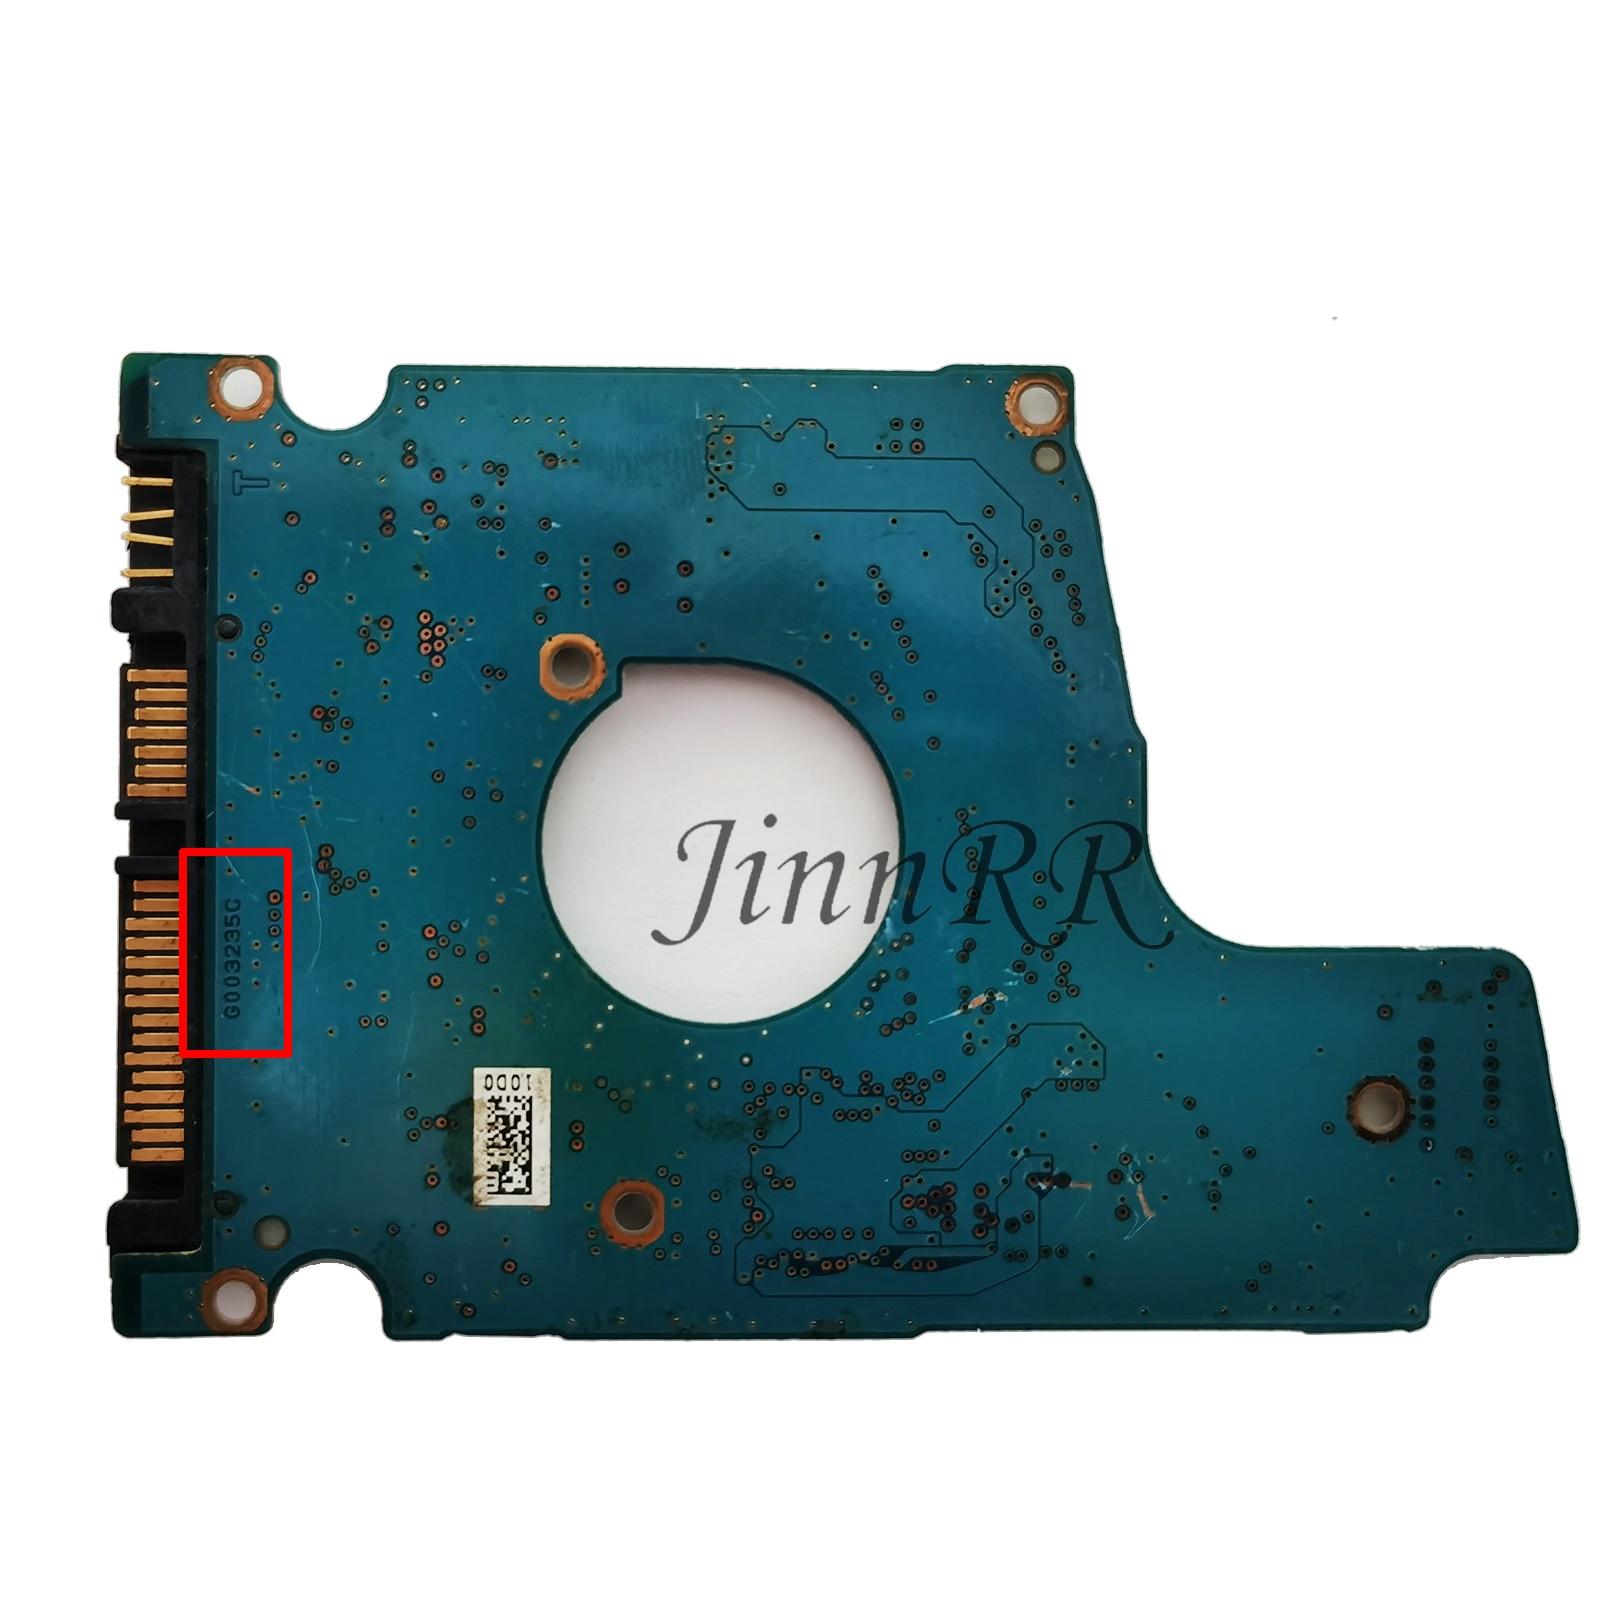 G003235B G003235C 100% tablero de disco duro Original, móvil, buena prueba, placa de circuito PCB G003235B G003235C